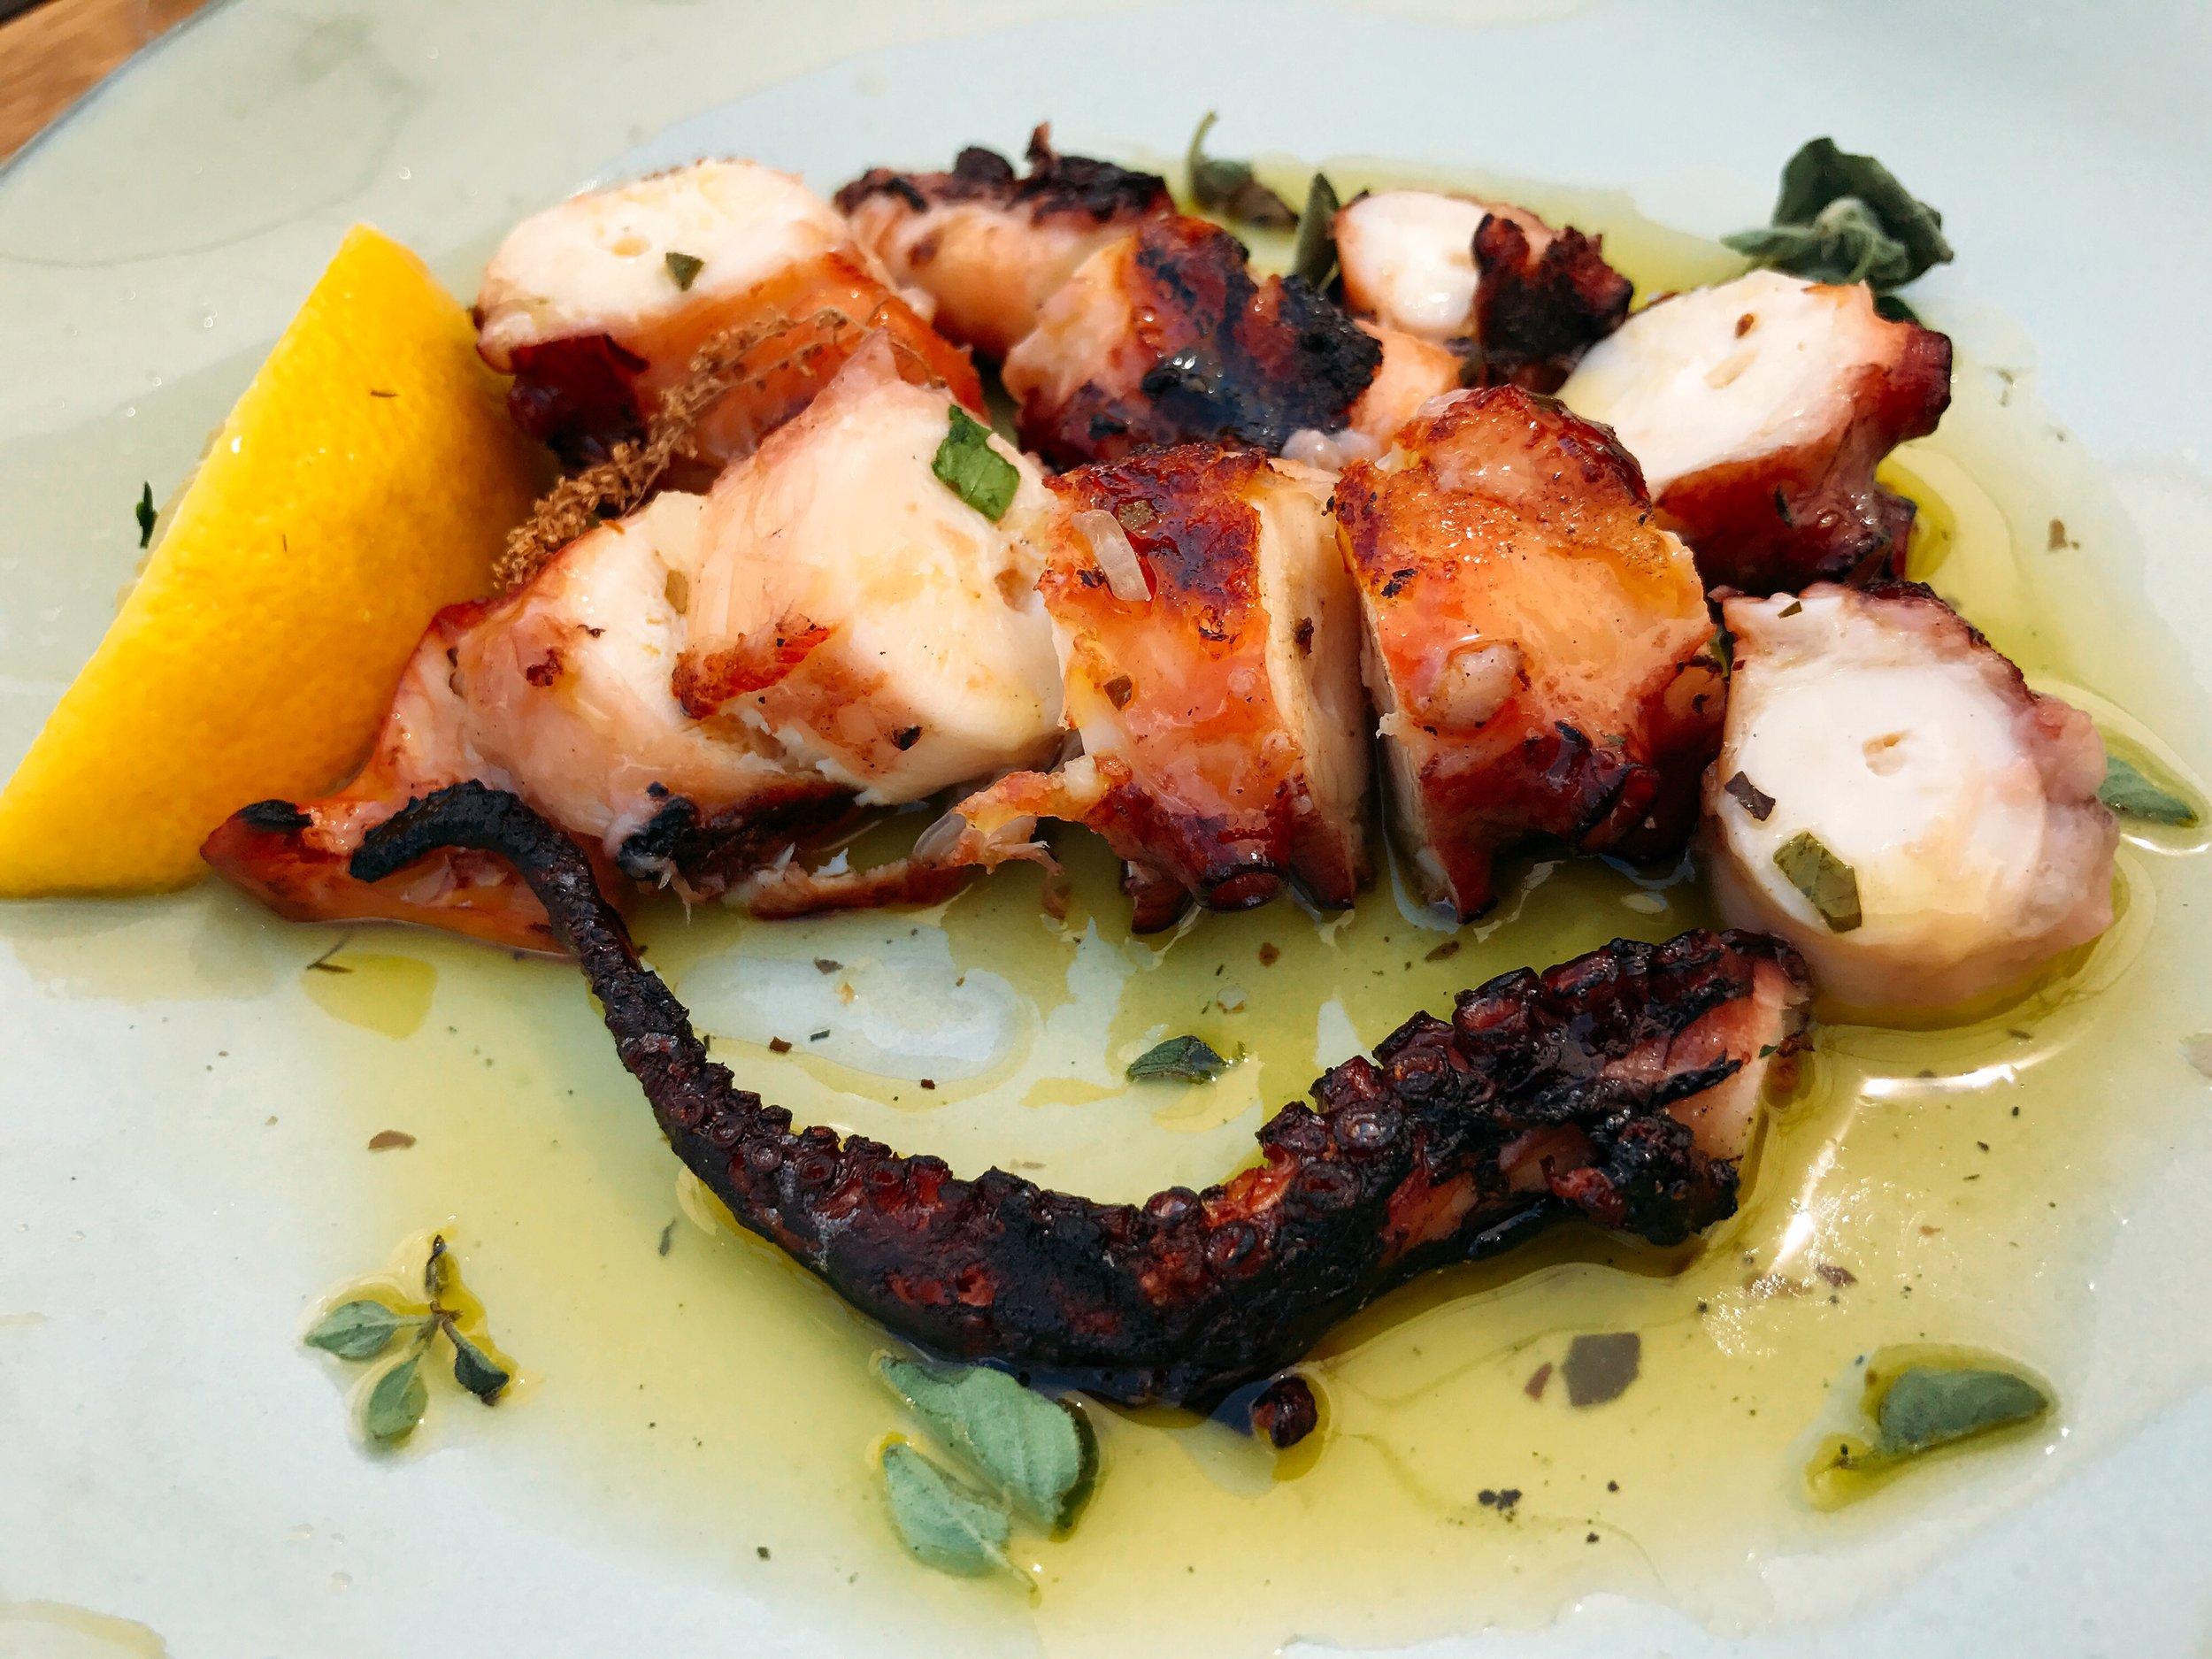 Spanish Octopus: Char-grilled Octopus with Lemon Vinaigrette and Oregano Leaves